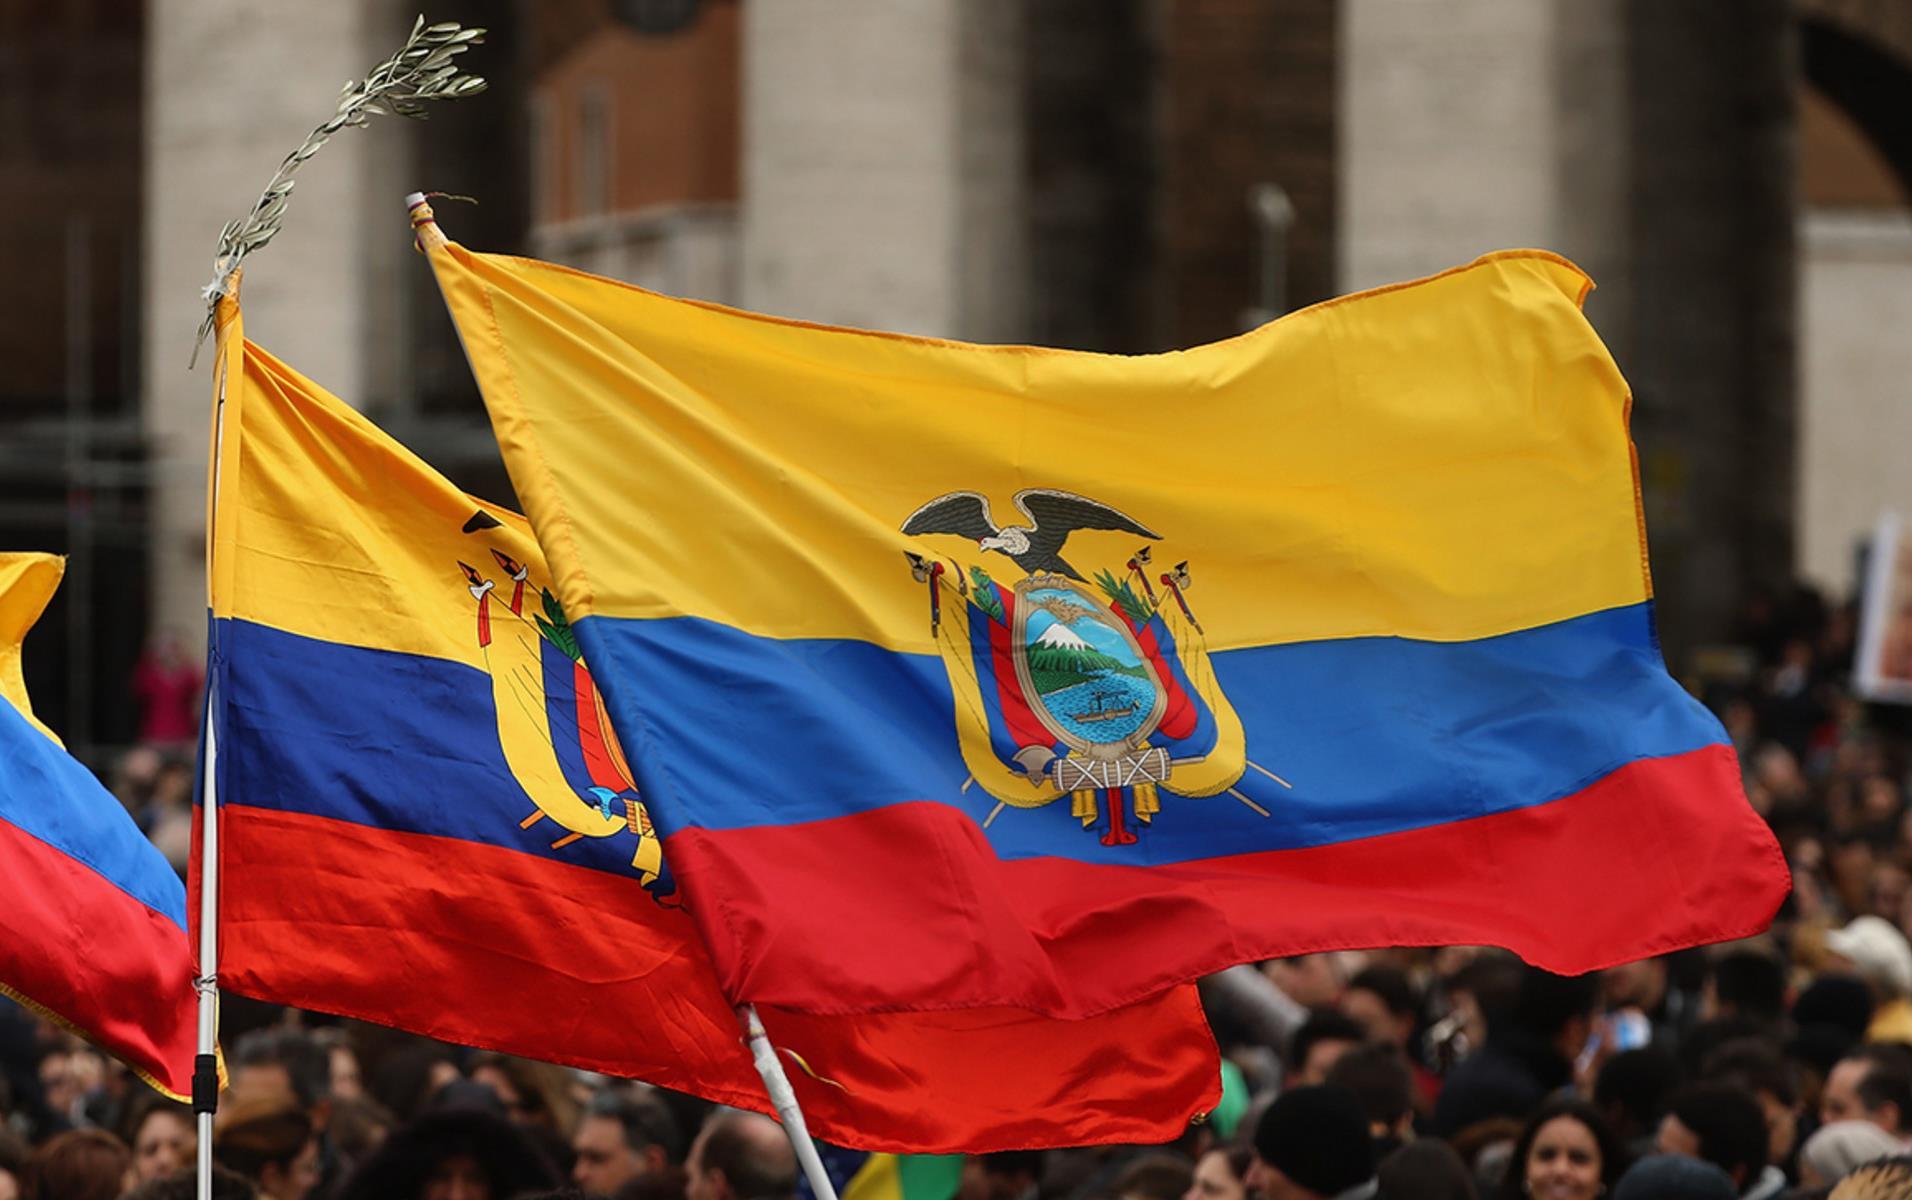 Ecuador Flags, Dan Kitwood photo